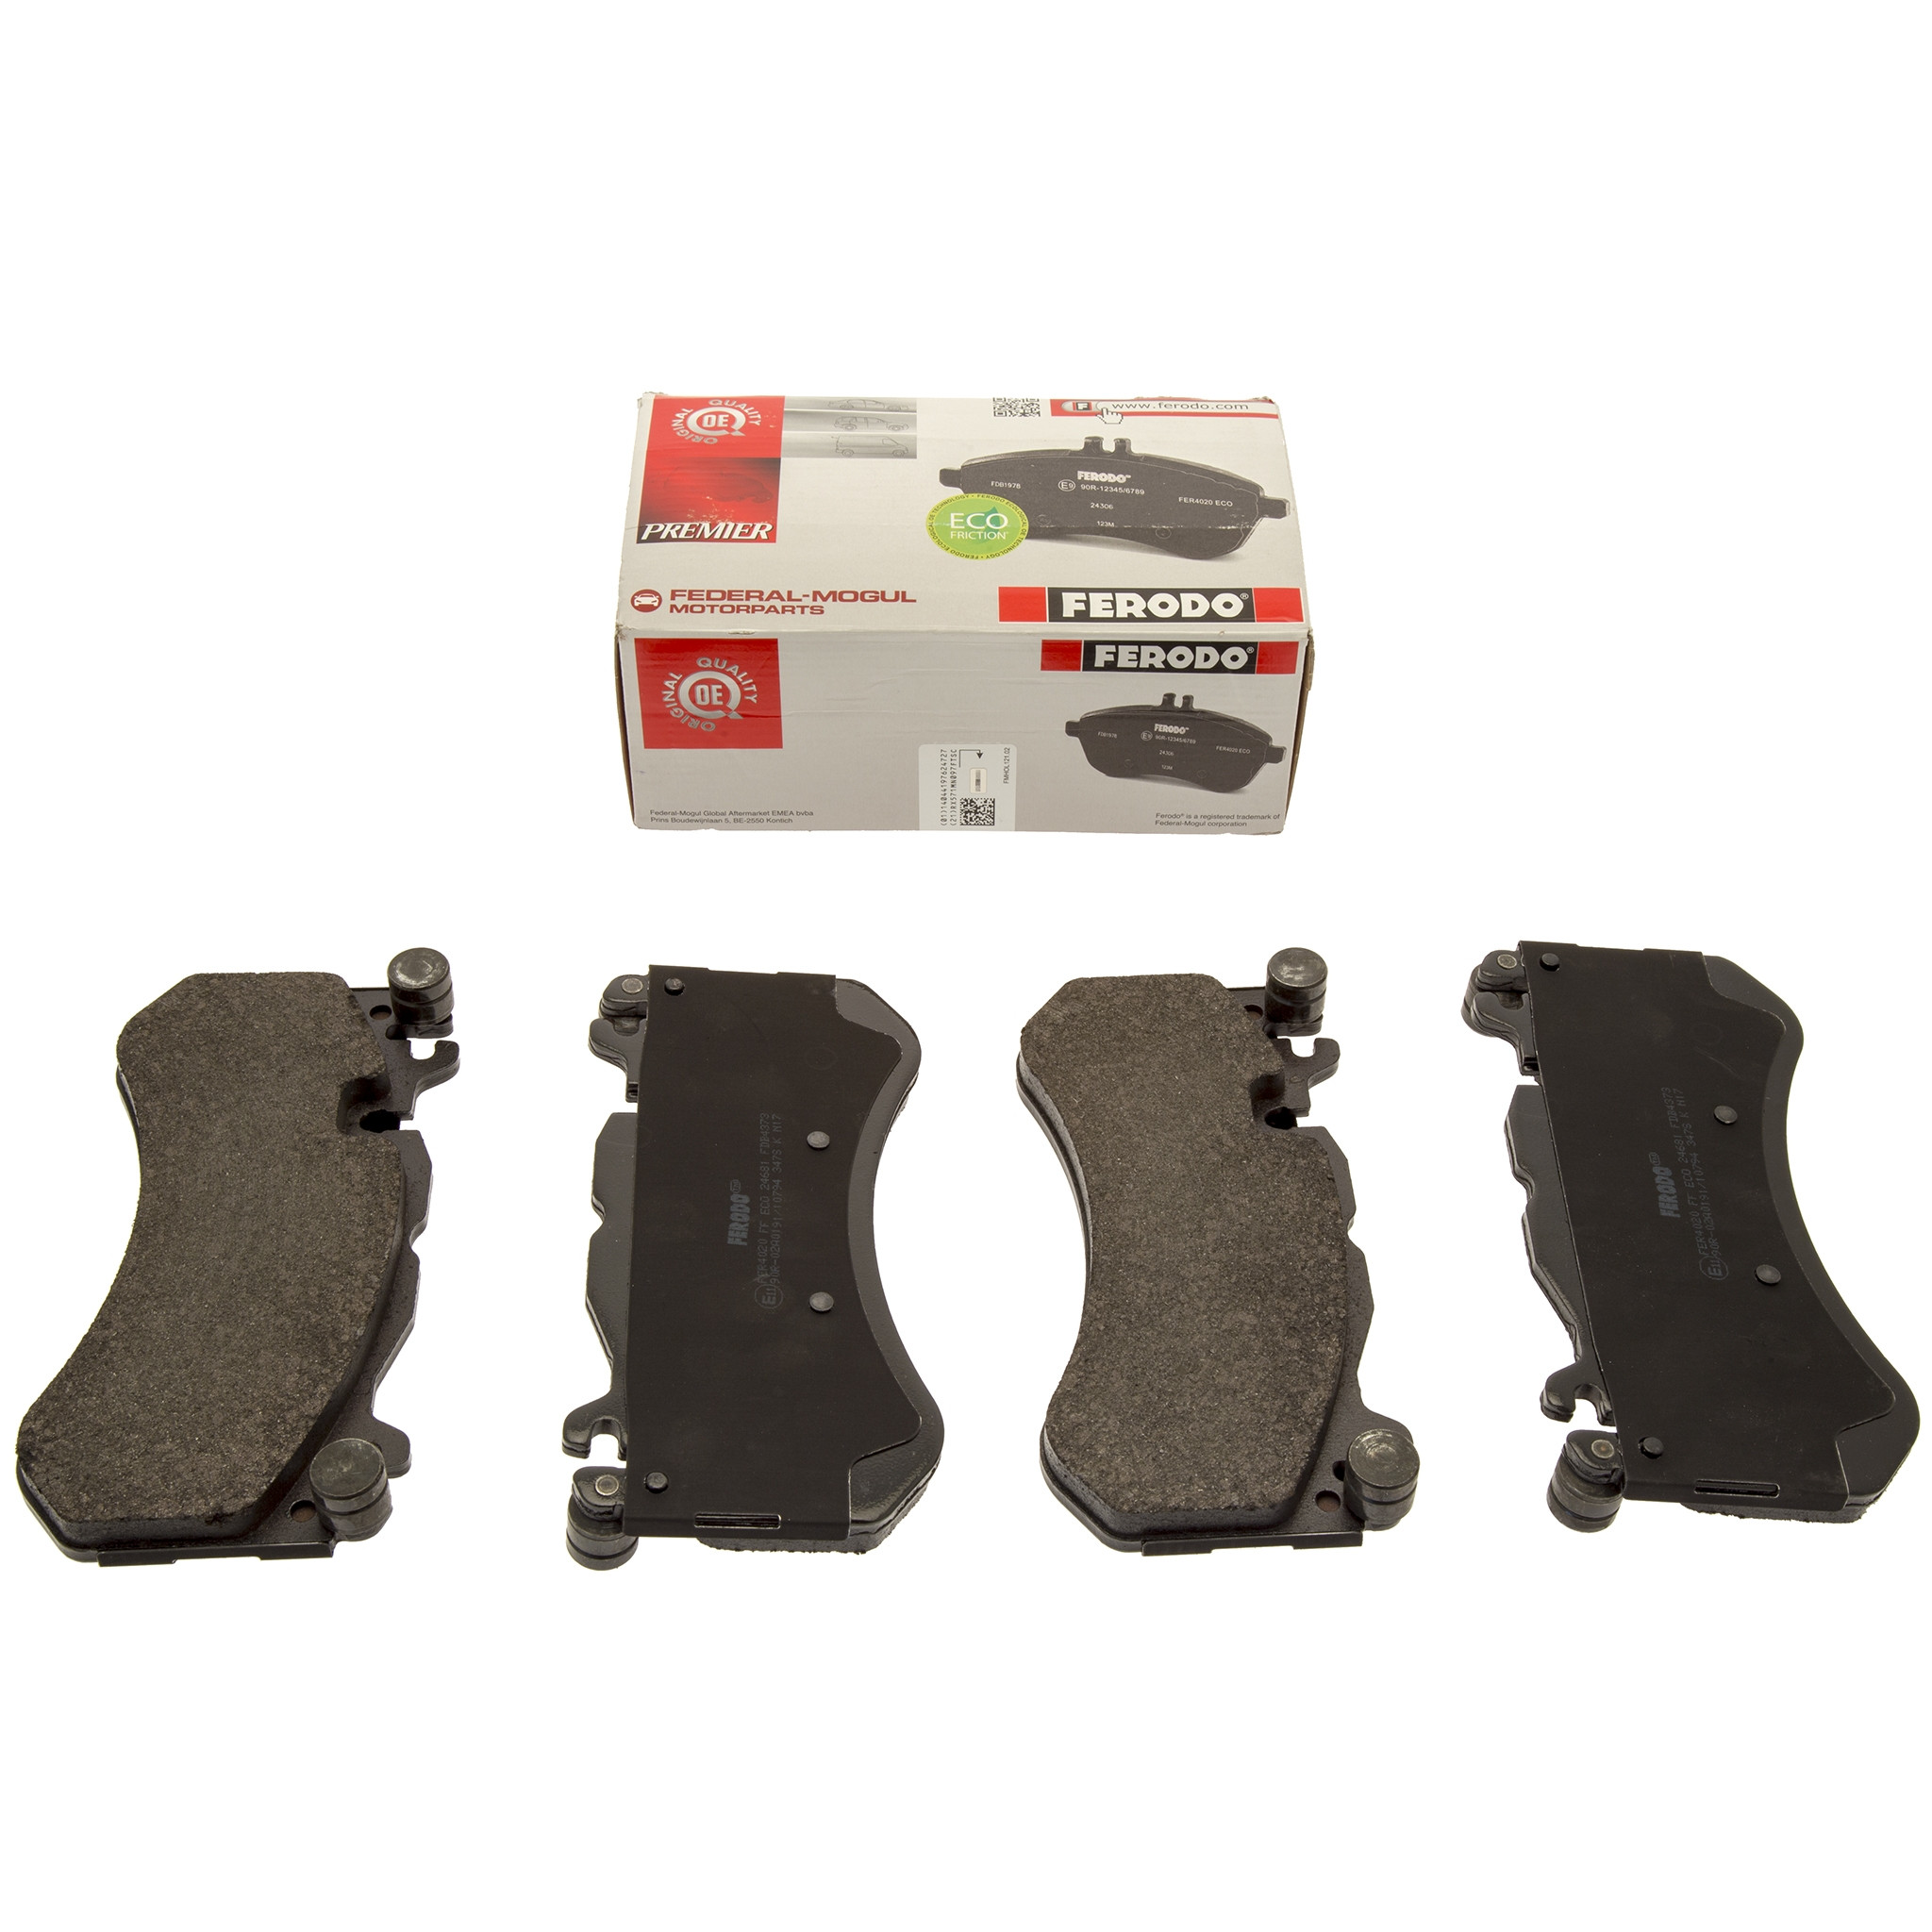 FOR AUDI RS6 C6 C7 RS7 FRONT PREMIUM APEC BRAKE PADS SET 4F0698151H BRAND NEW